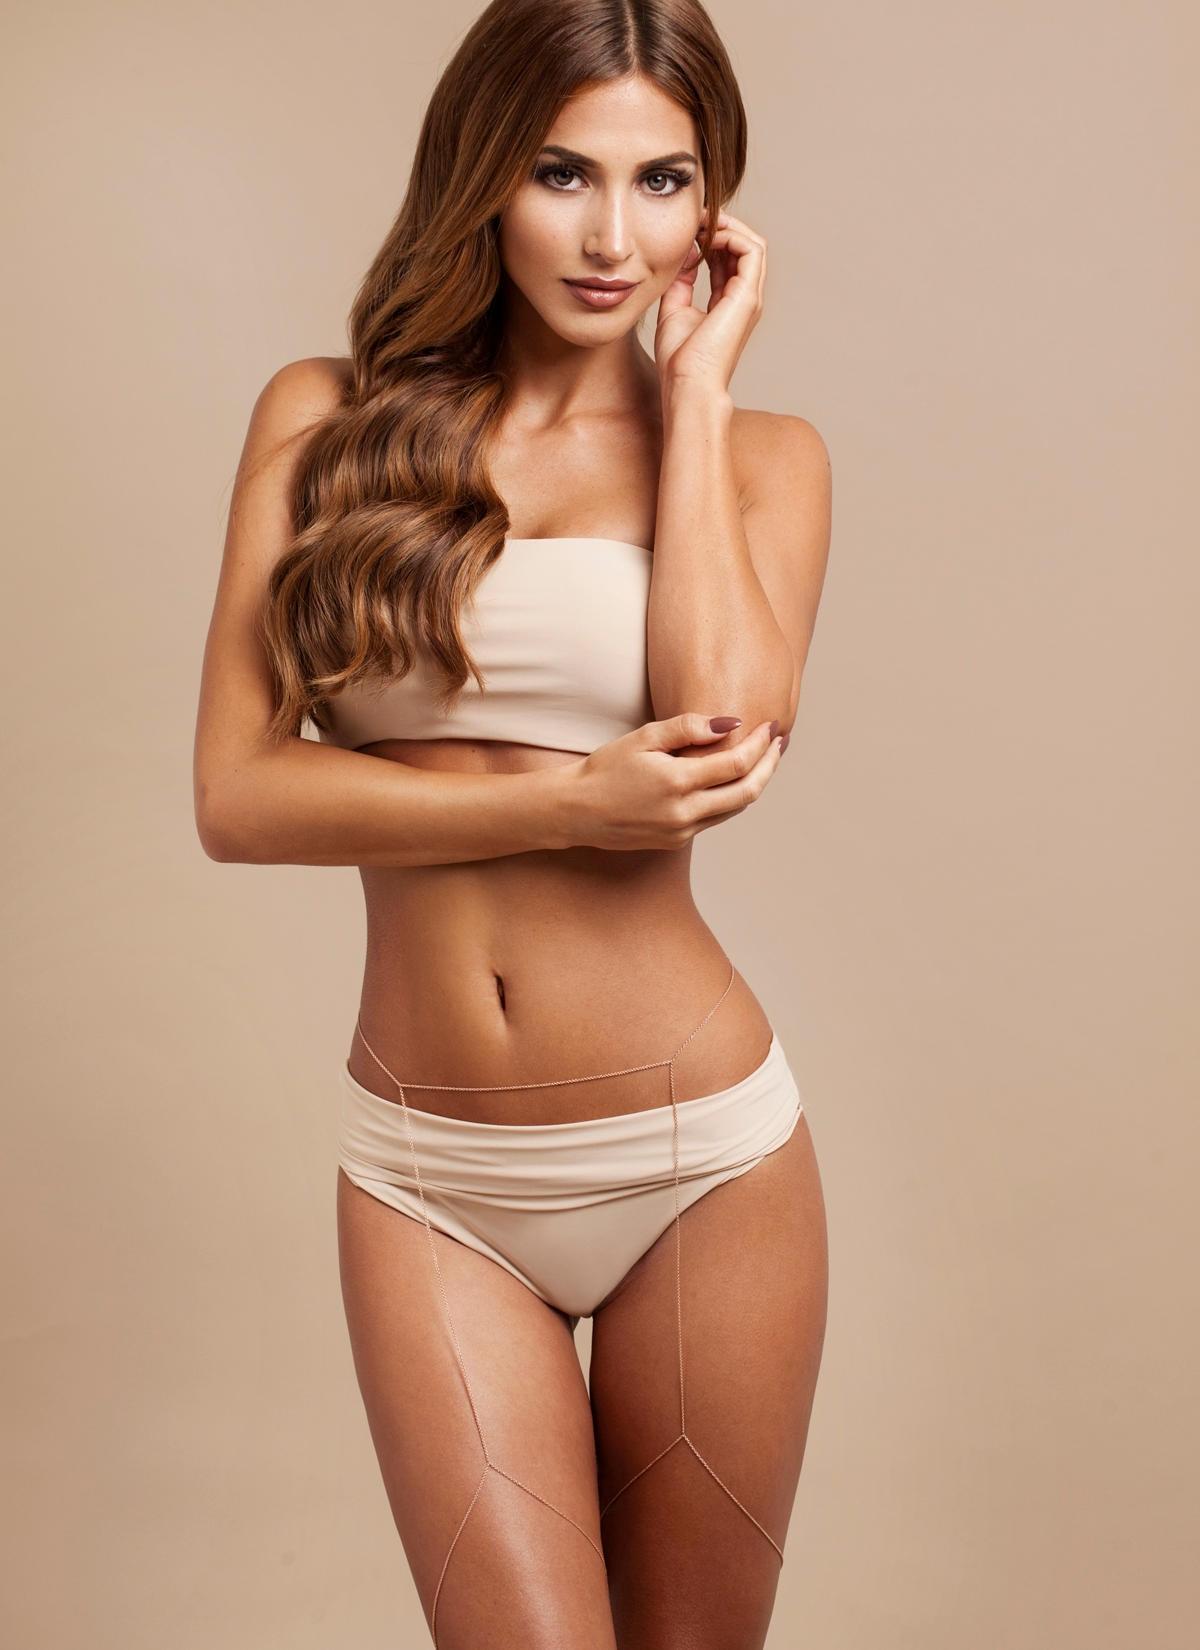 Angelique Pettyjohn Topless ann-kathrin br�mmel: sexy bikini-fotos aus der karibik